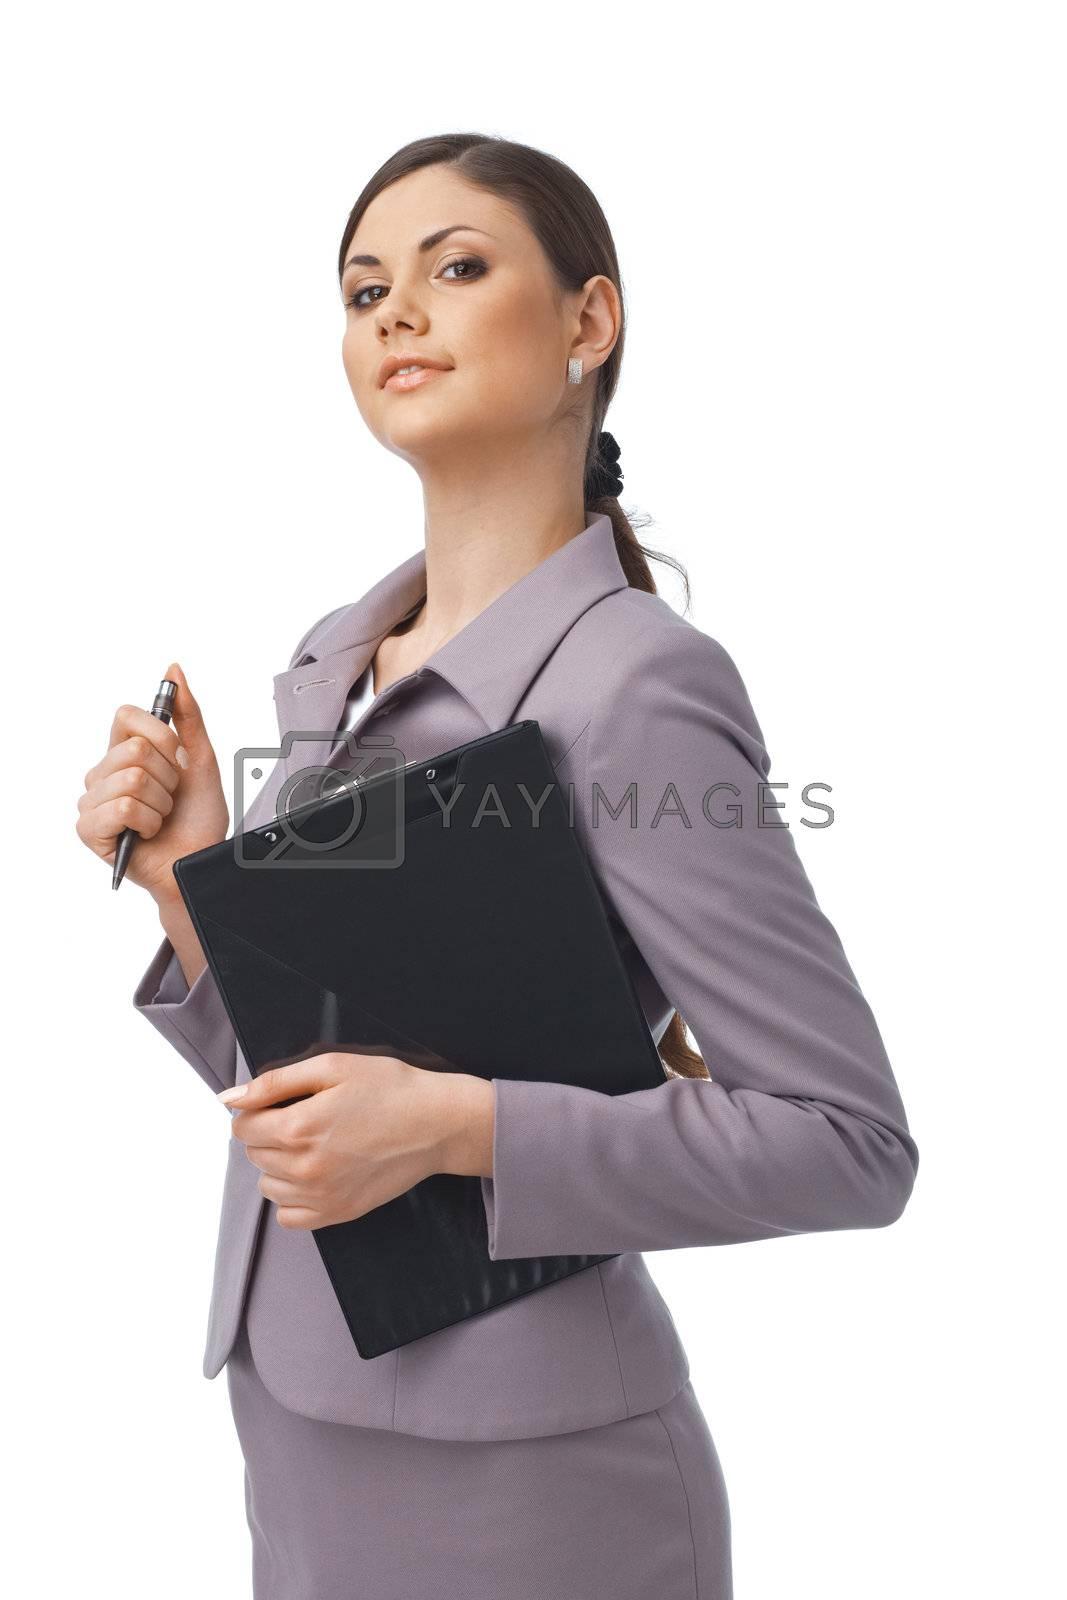 Confident Young Businesswoman by romanshyshak